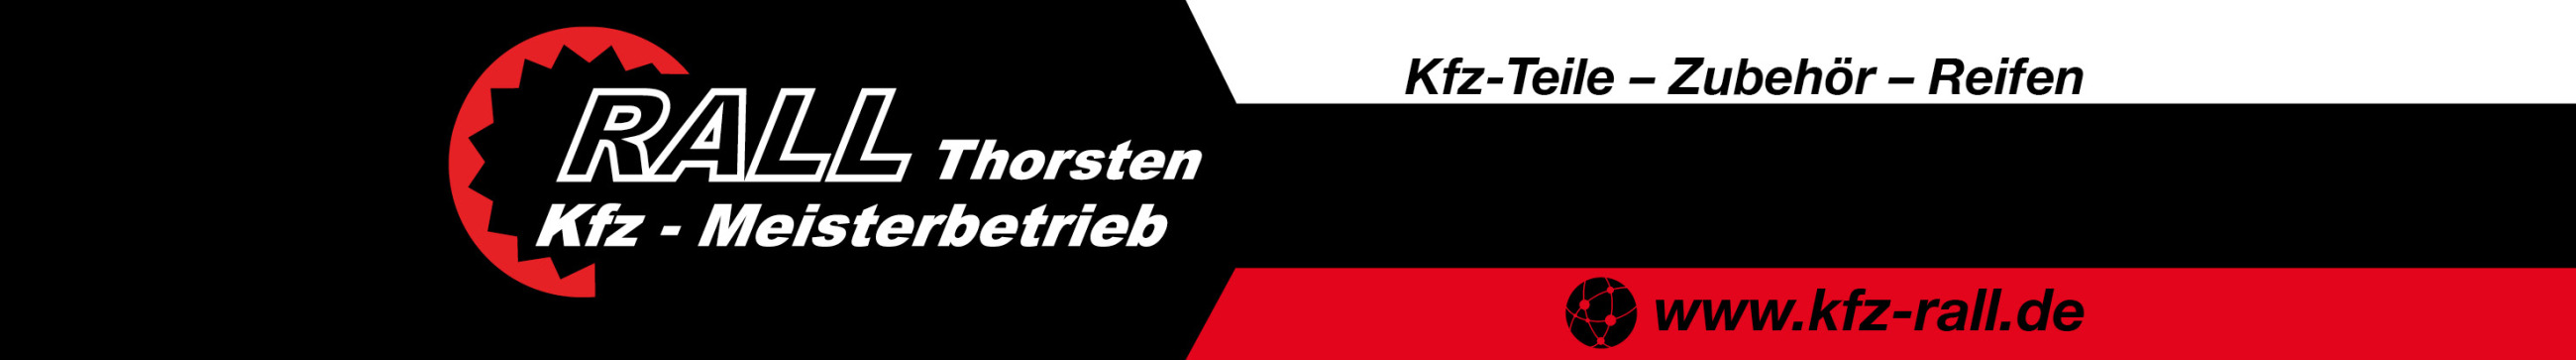 Kfz-Meisterbetrieb Rall Fluorn-Winzeln